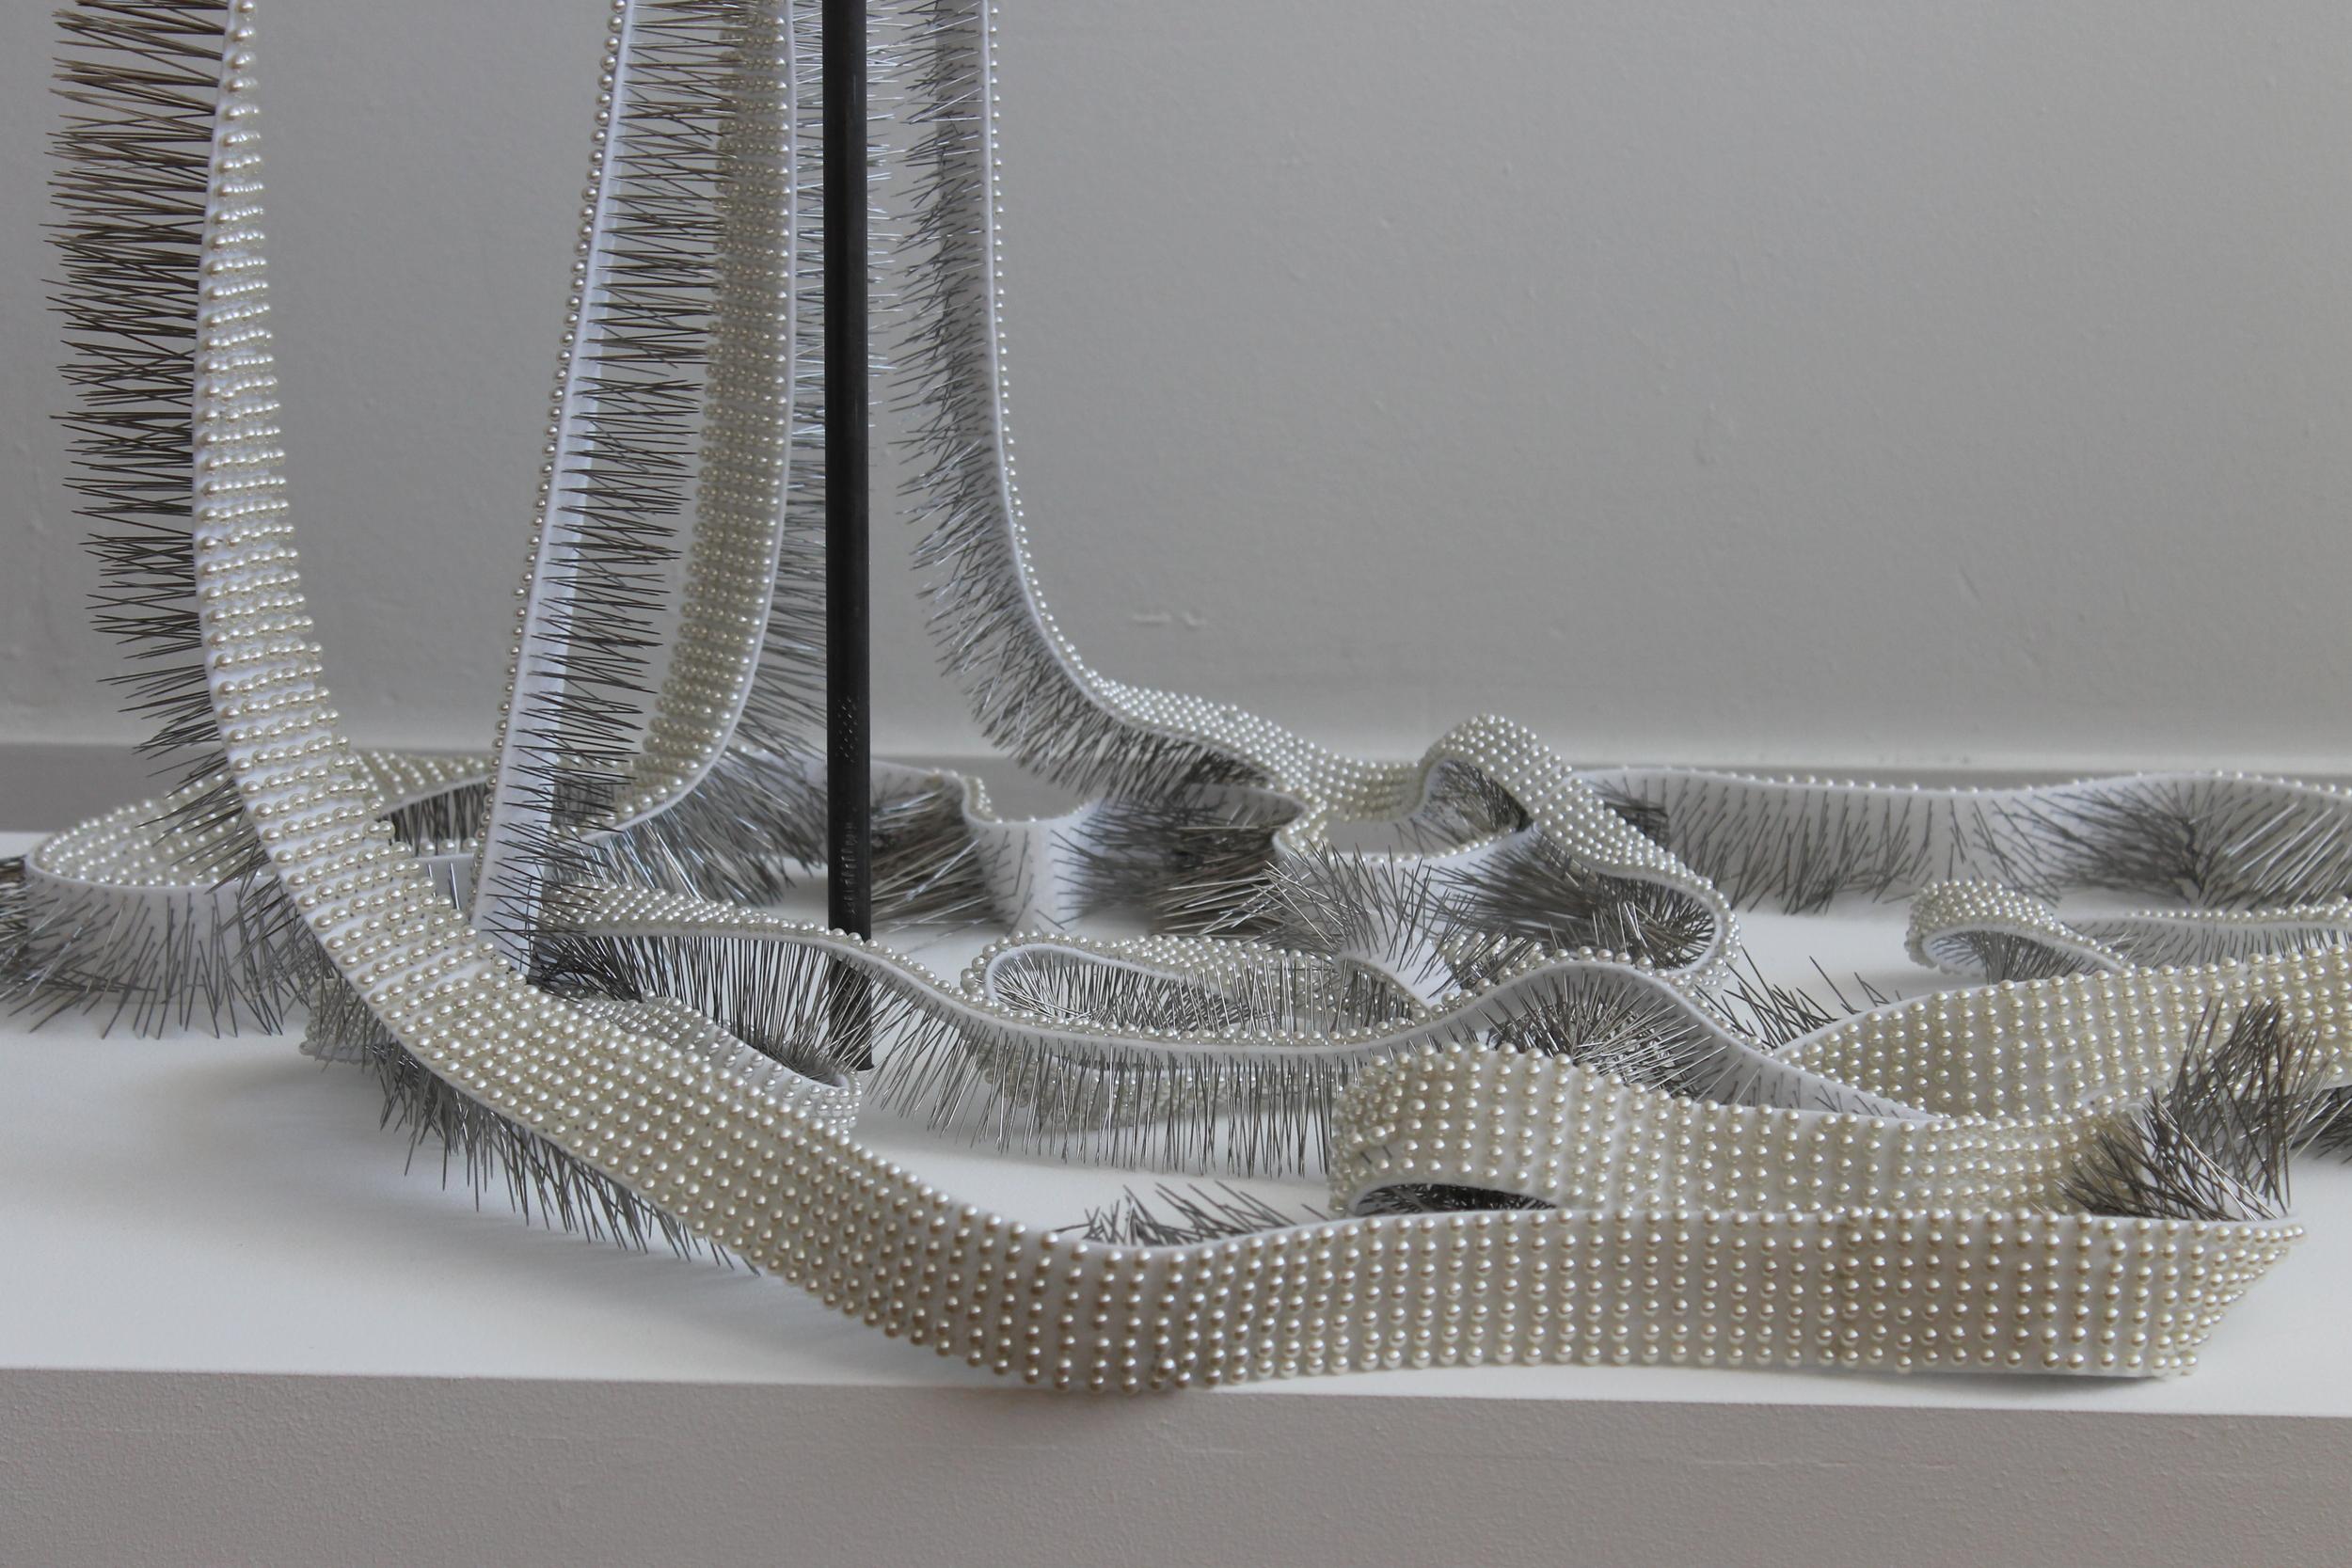 "Seer Bonnet XXI (Eliza Partridge) and Seer Bonnet XX (Emily Partridge) (detail) 39, 804 pearl corsage pins, fabric, steel, wood, 28"" x 68"" x 4"", 2011"